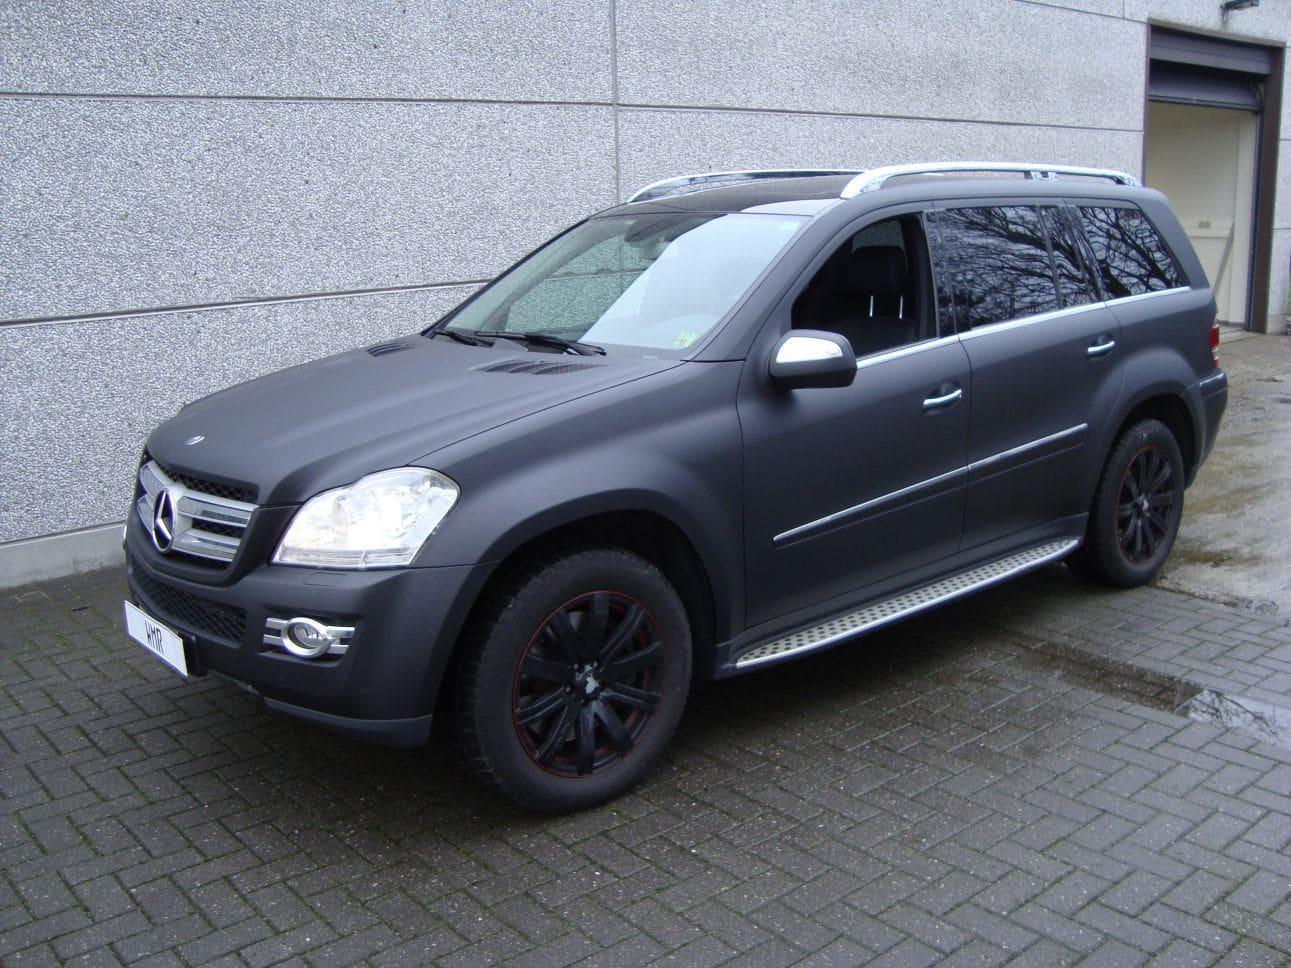 Mercedes GL met Mat Zwarte Wrap, Carwrapping door Wrapmyride.nu Foto-nr:6278, ©2021